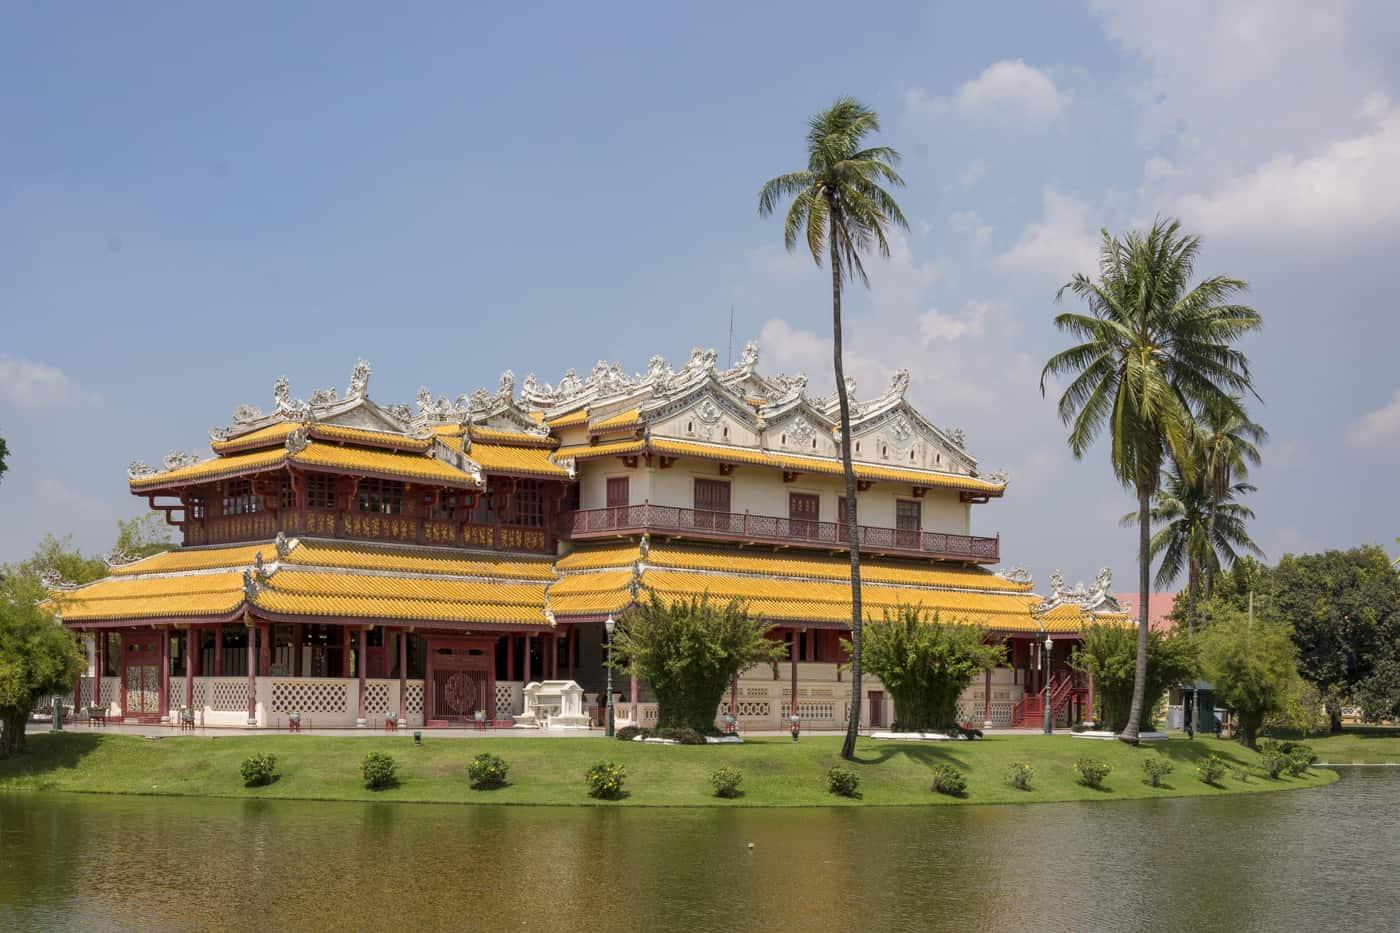 Phra Thinang Wehart Chamrun in Bang Pa-In Sommerpalast mit Palmen davor